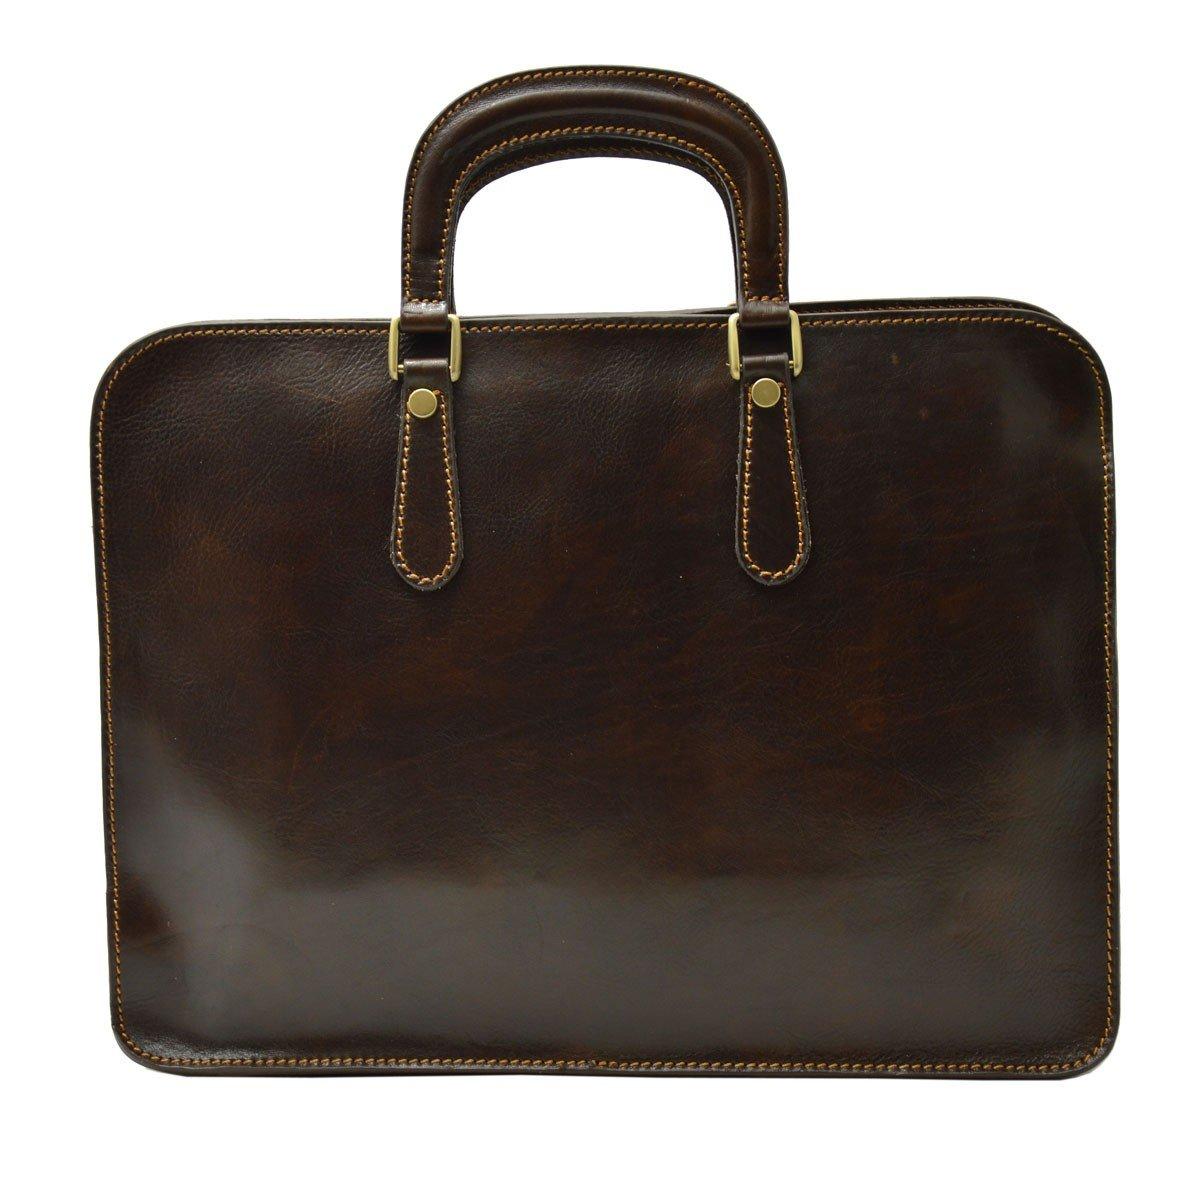 Dream Leather Bags Made in Italy Genuine Leather メンズ 530-3 US サイズ: 1 M US カラー: ブラウン   B078XGFK8F